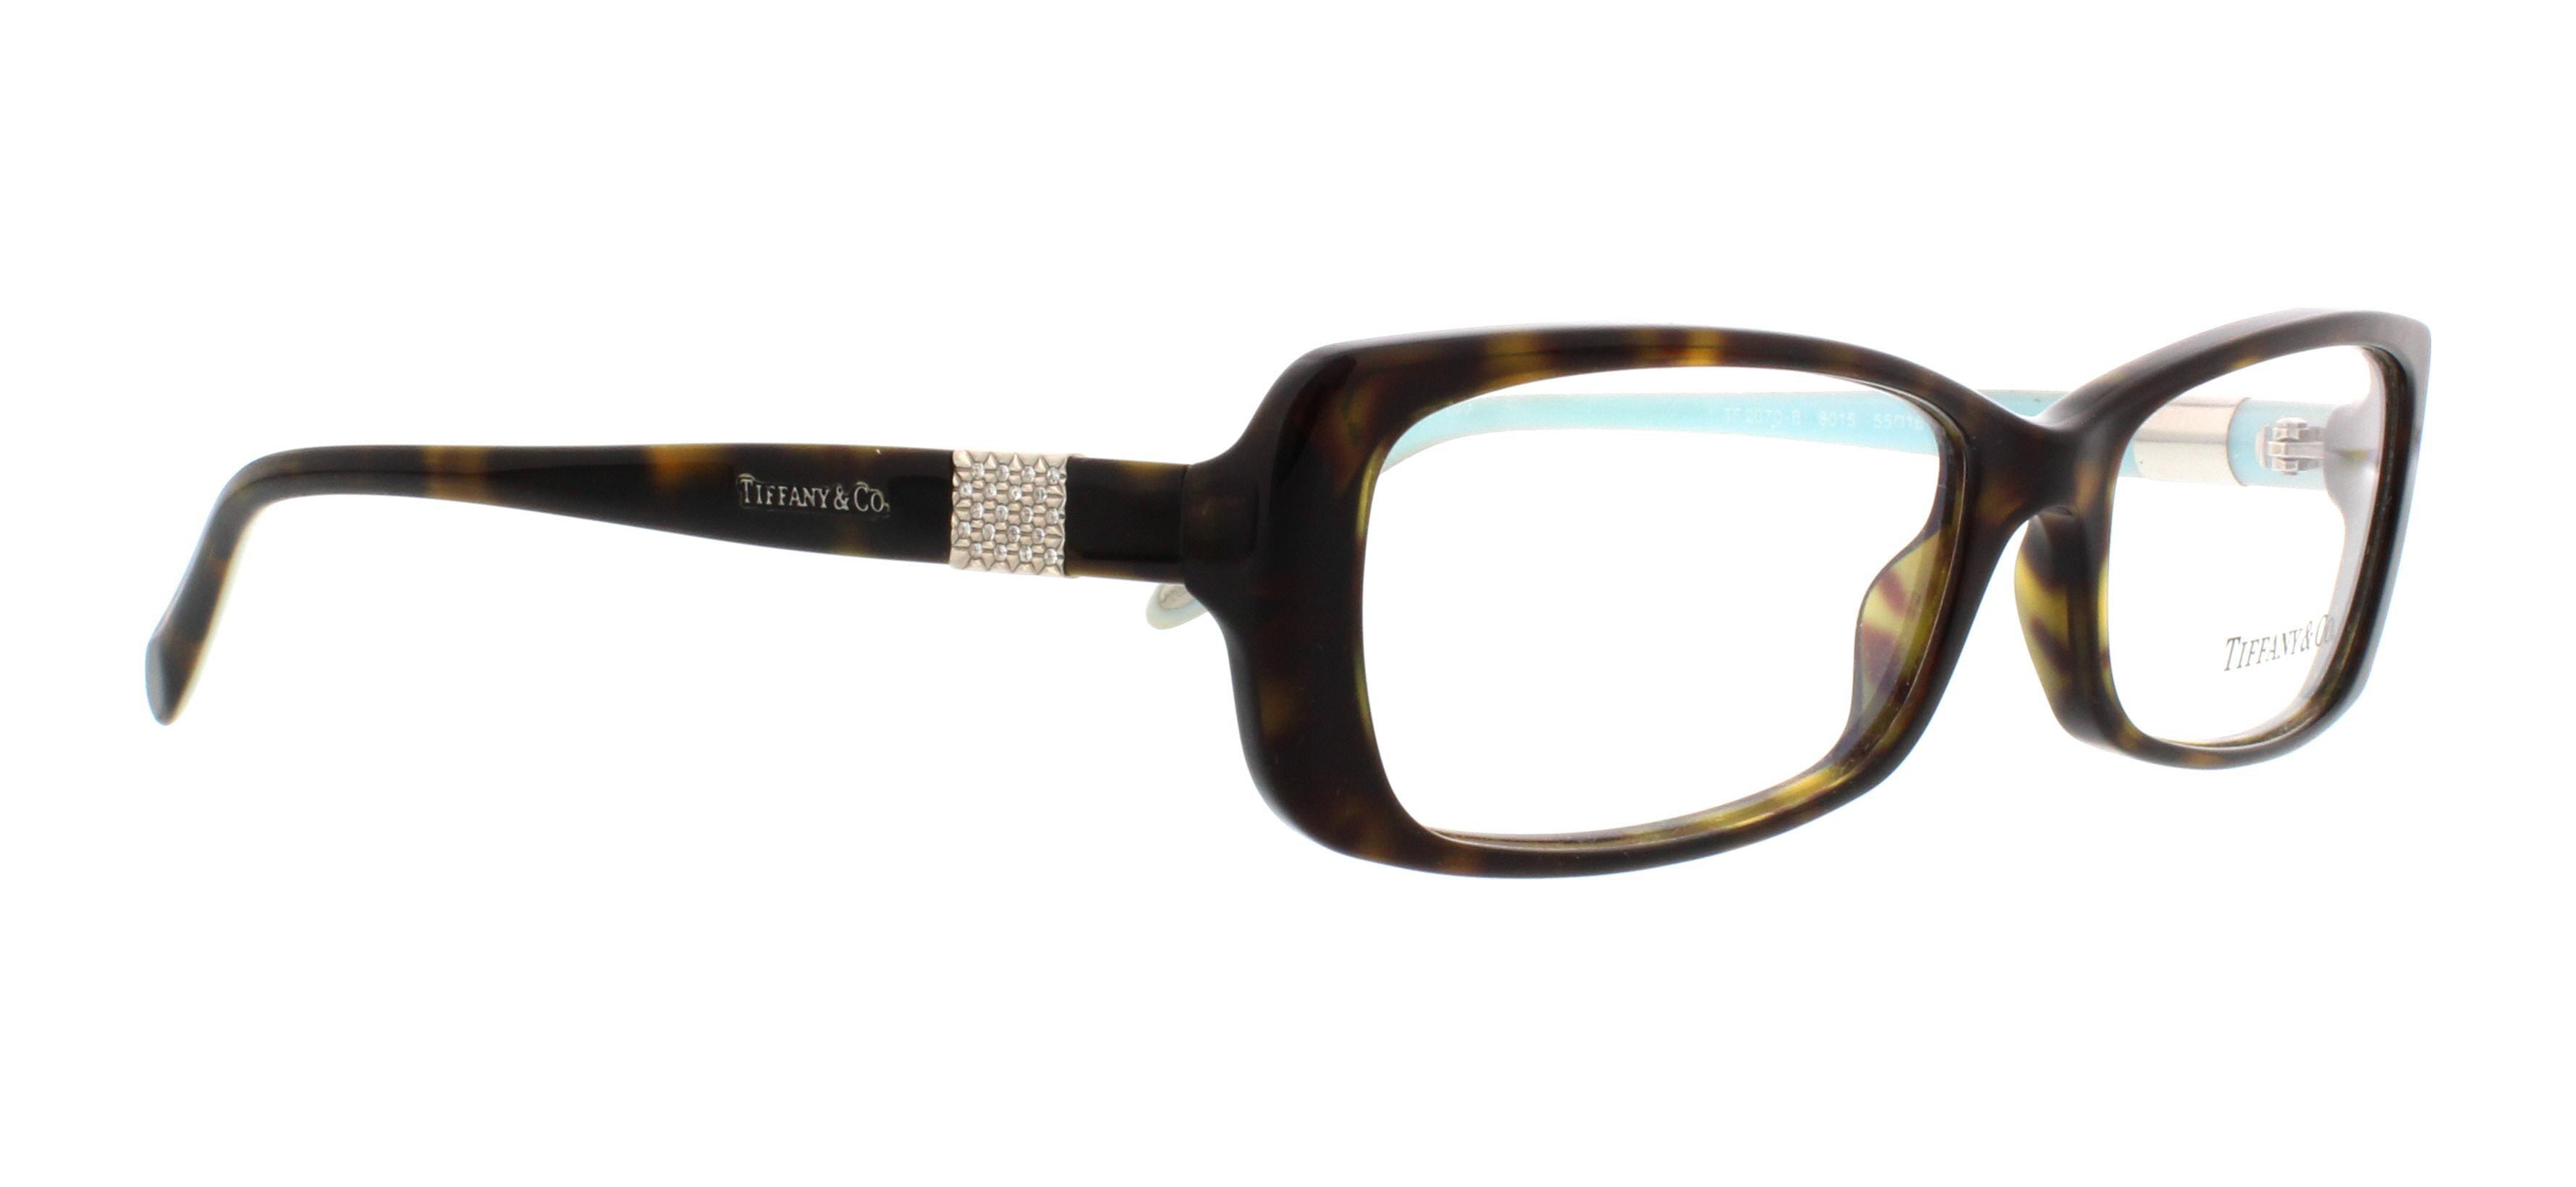 d86f26a5fde TIFFANY Eyeglasses TF 2070B 8015 Havana 55MM - Walmart.com